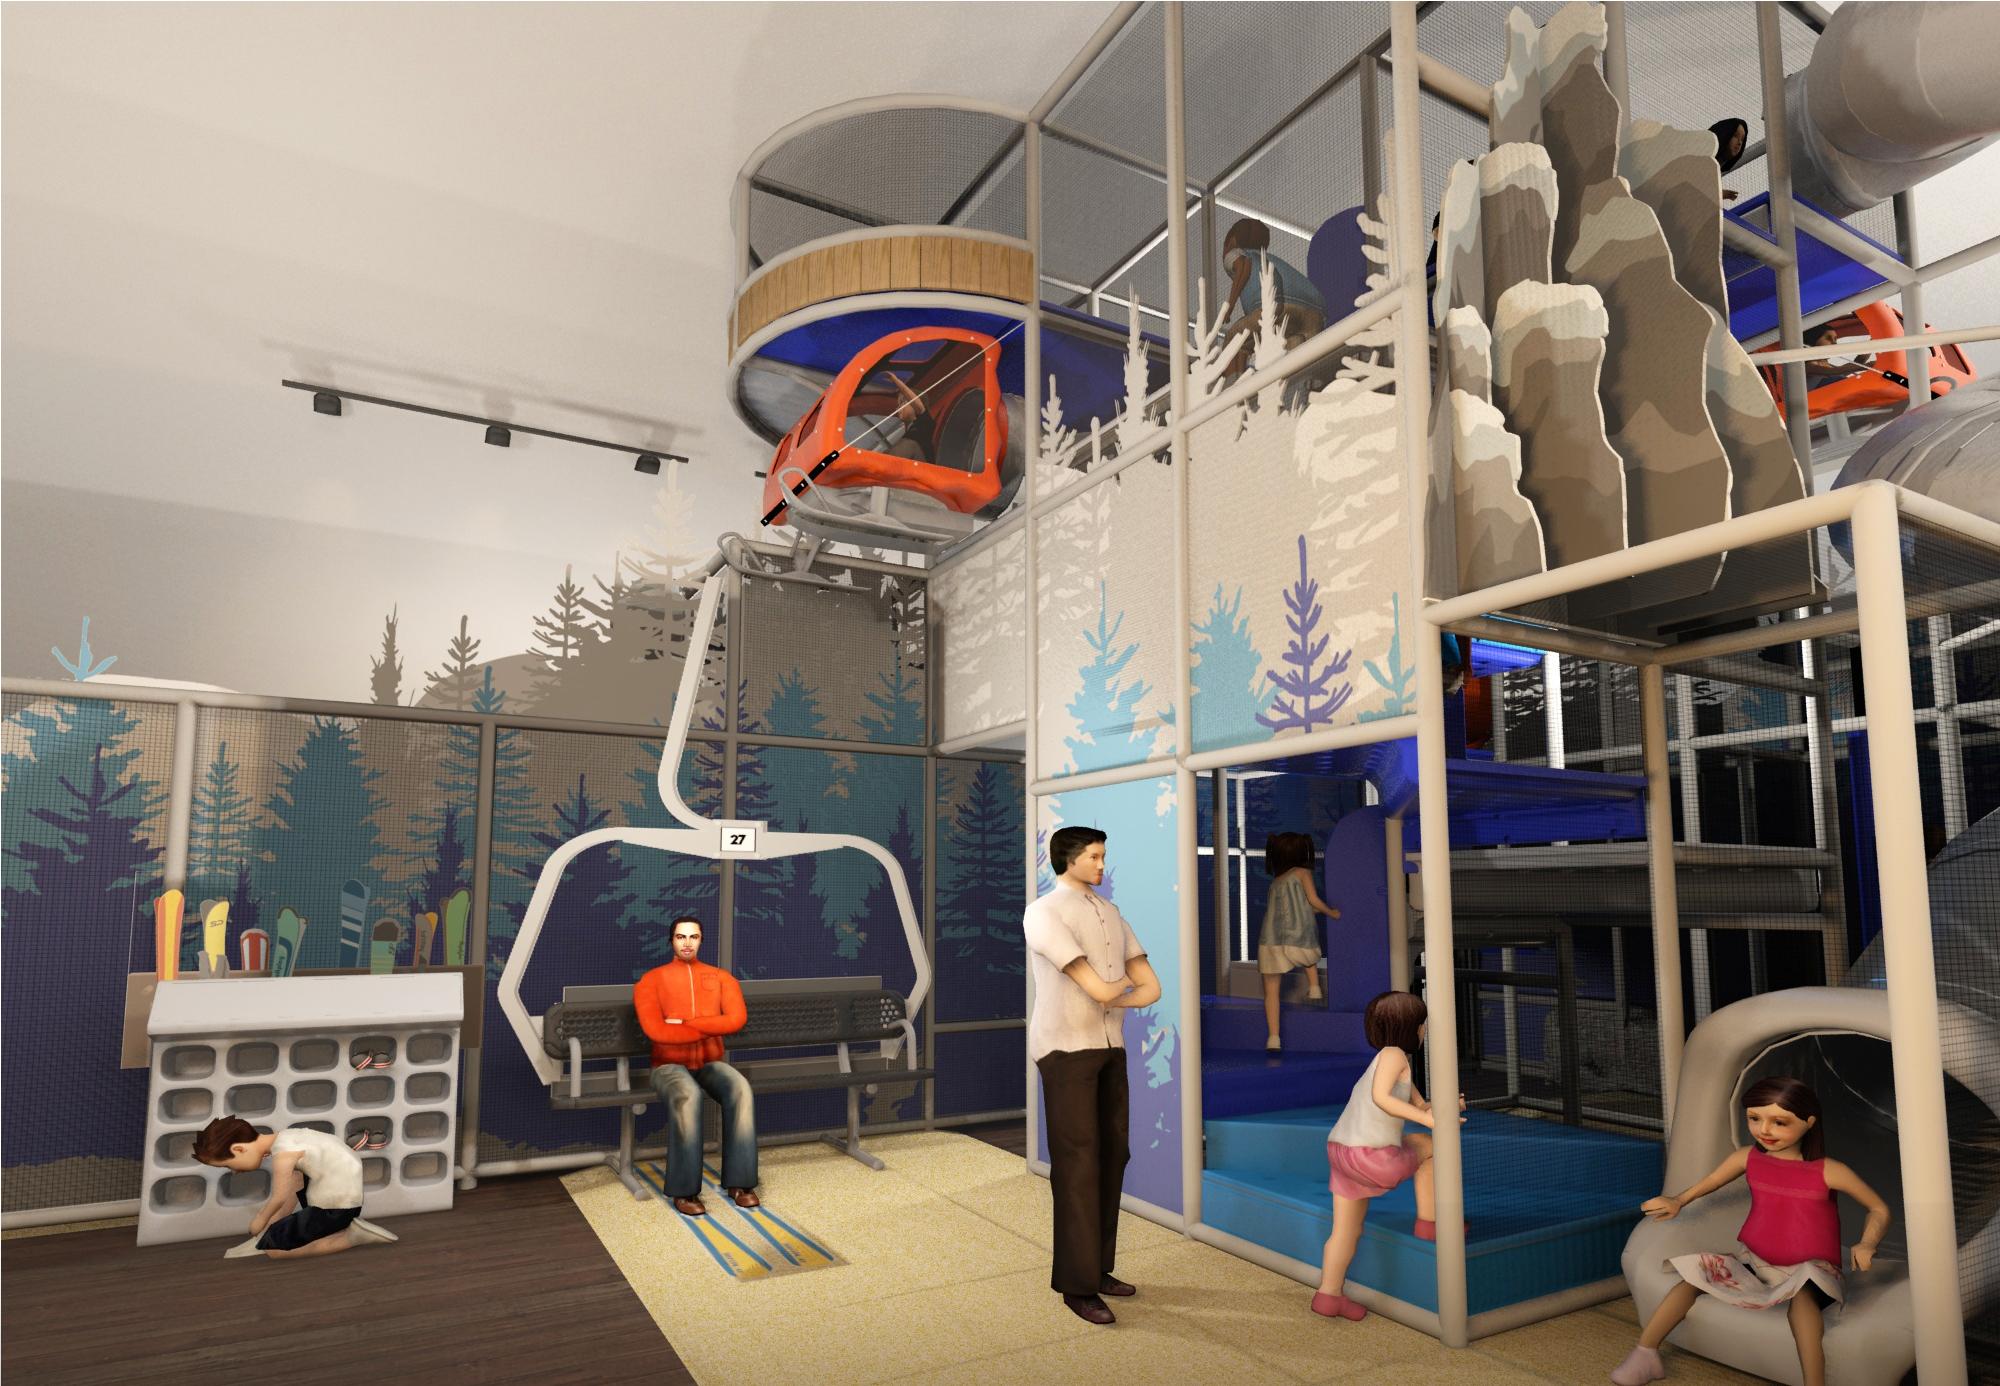 Ski resort play area